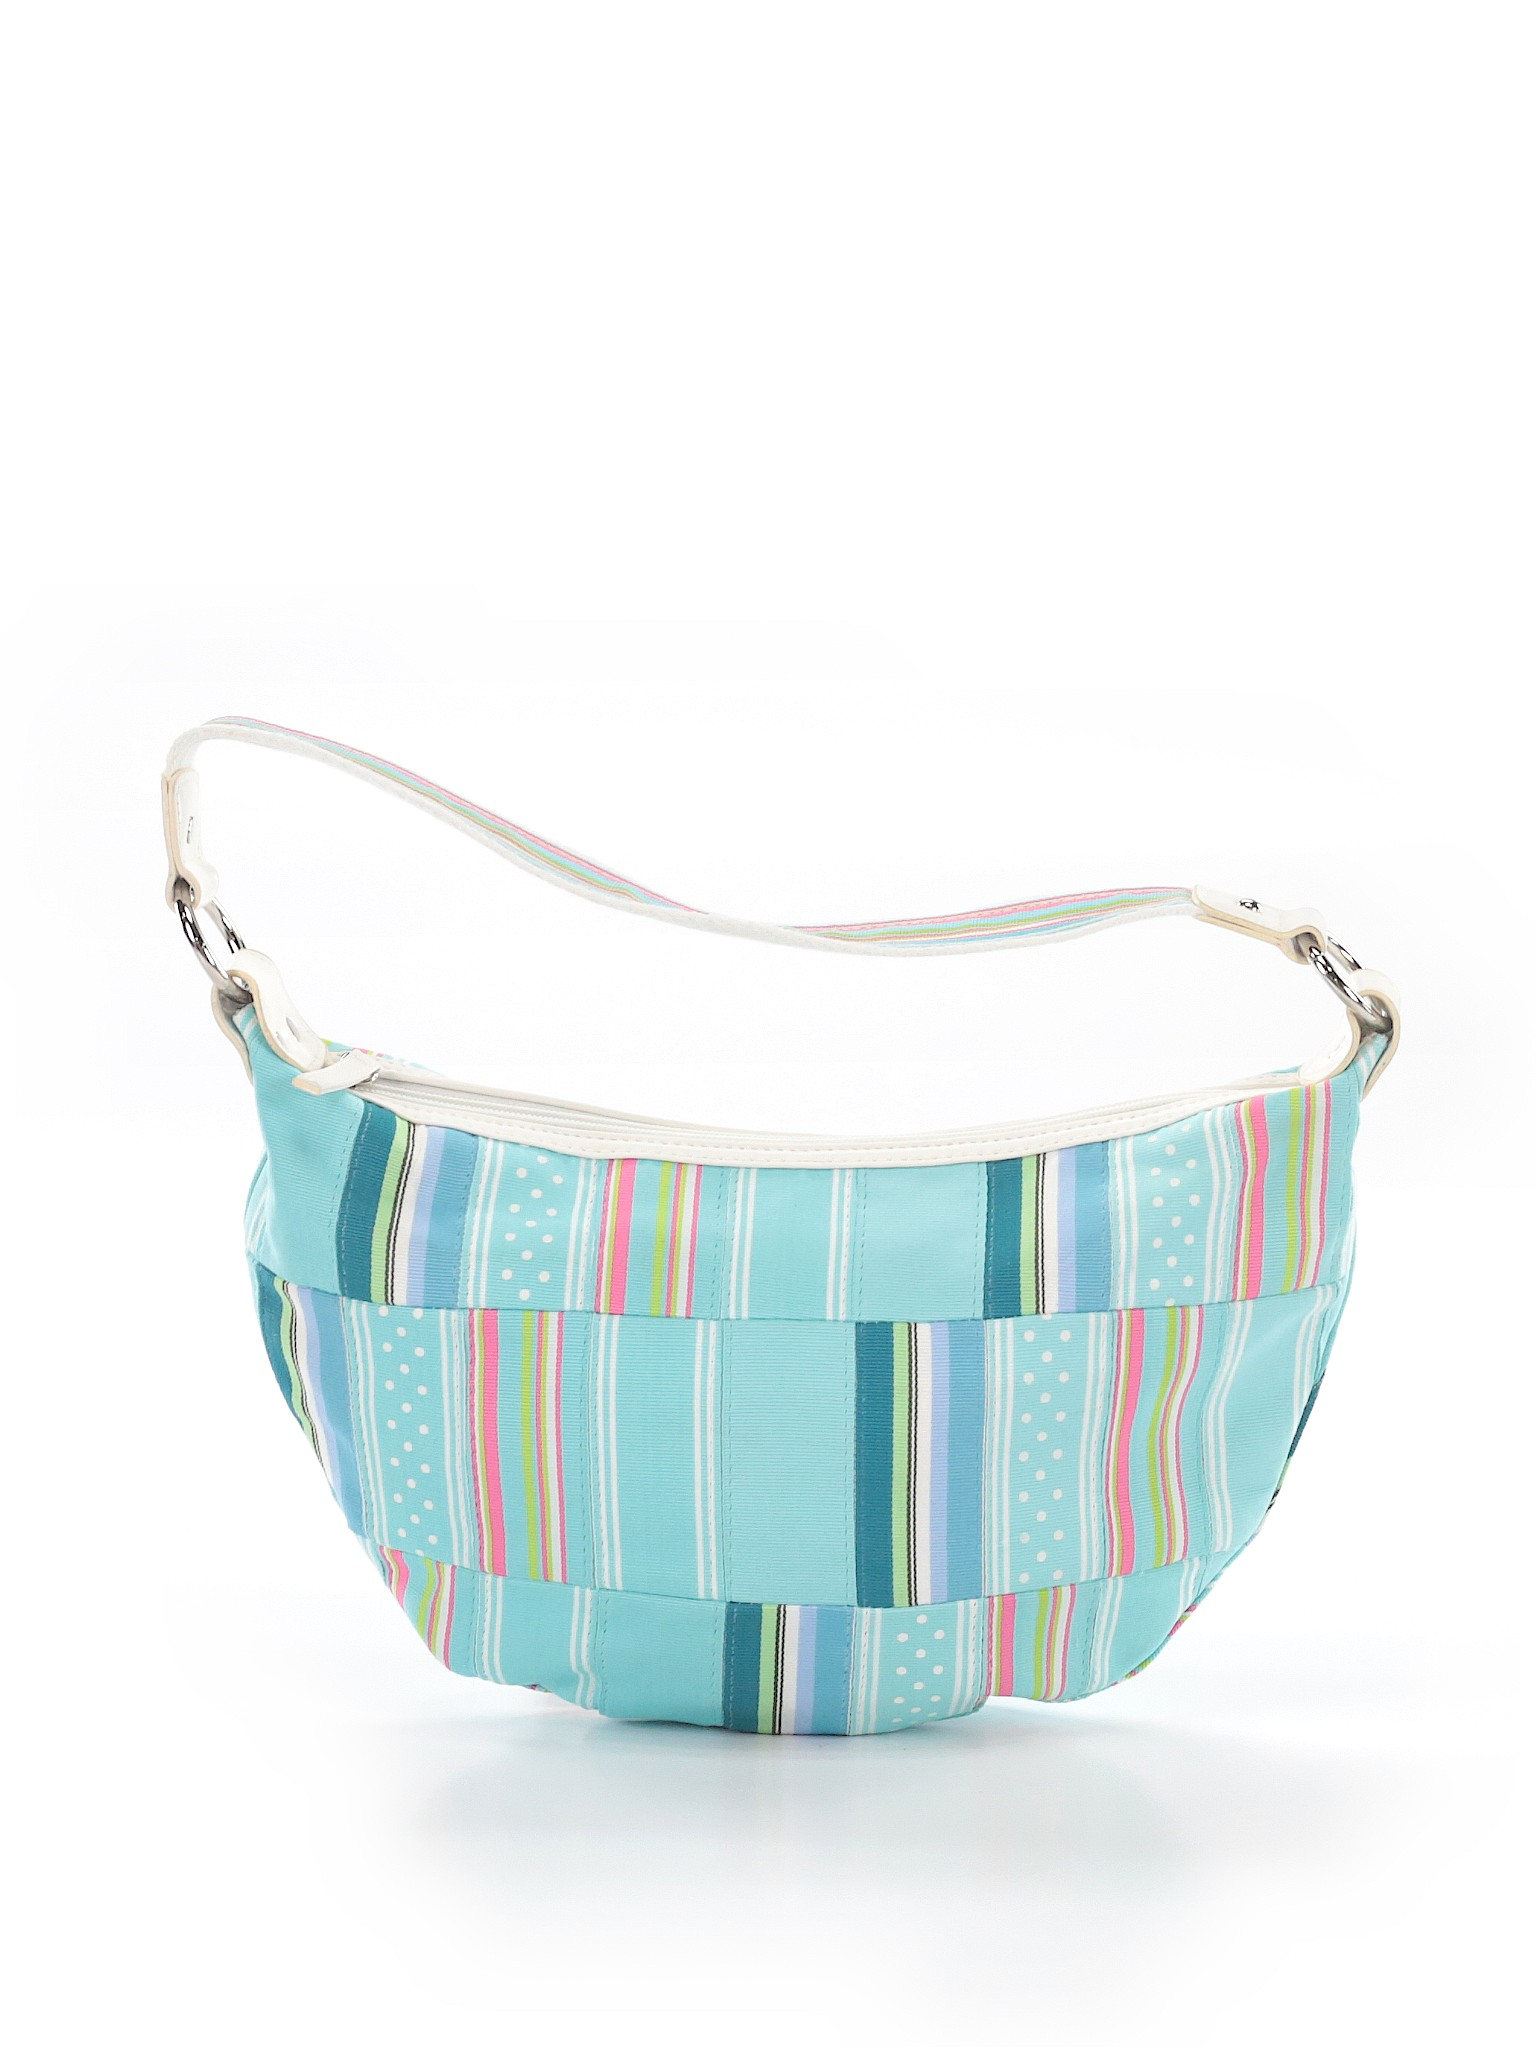 Tianni Handbags Shoulder Bag Size Na Light Blue Women S Bags 30 99